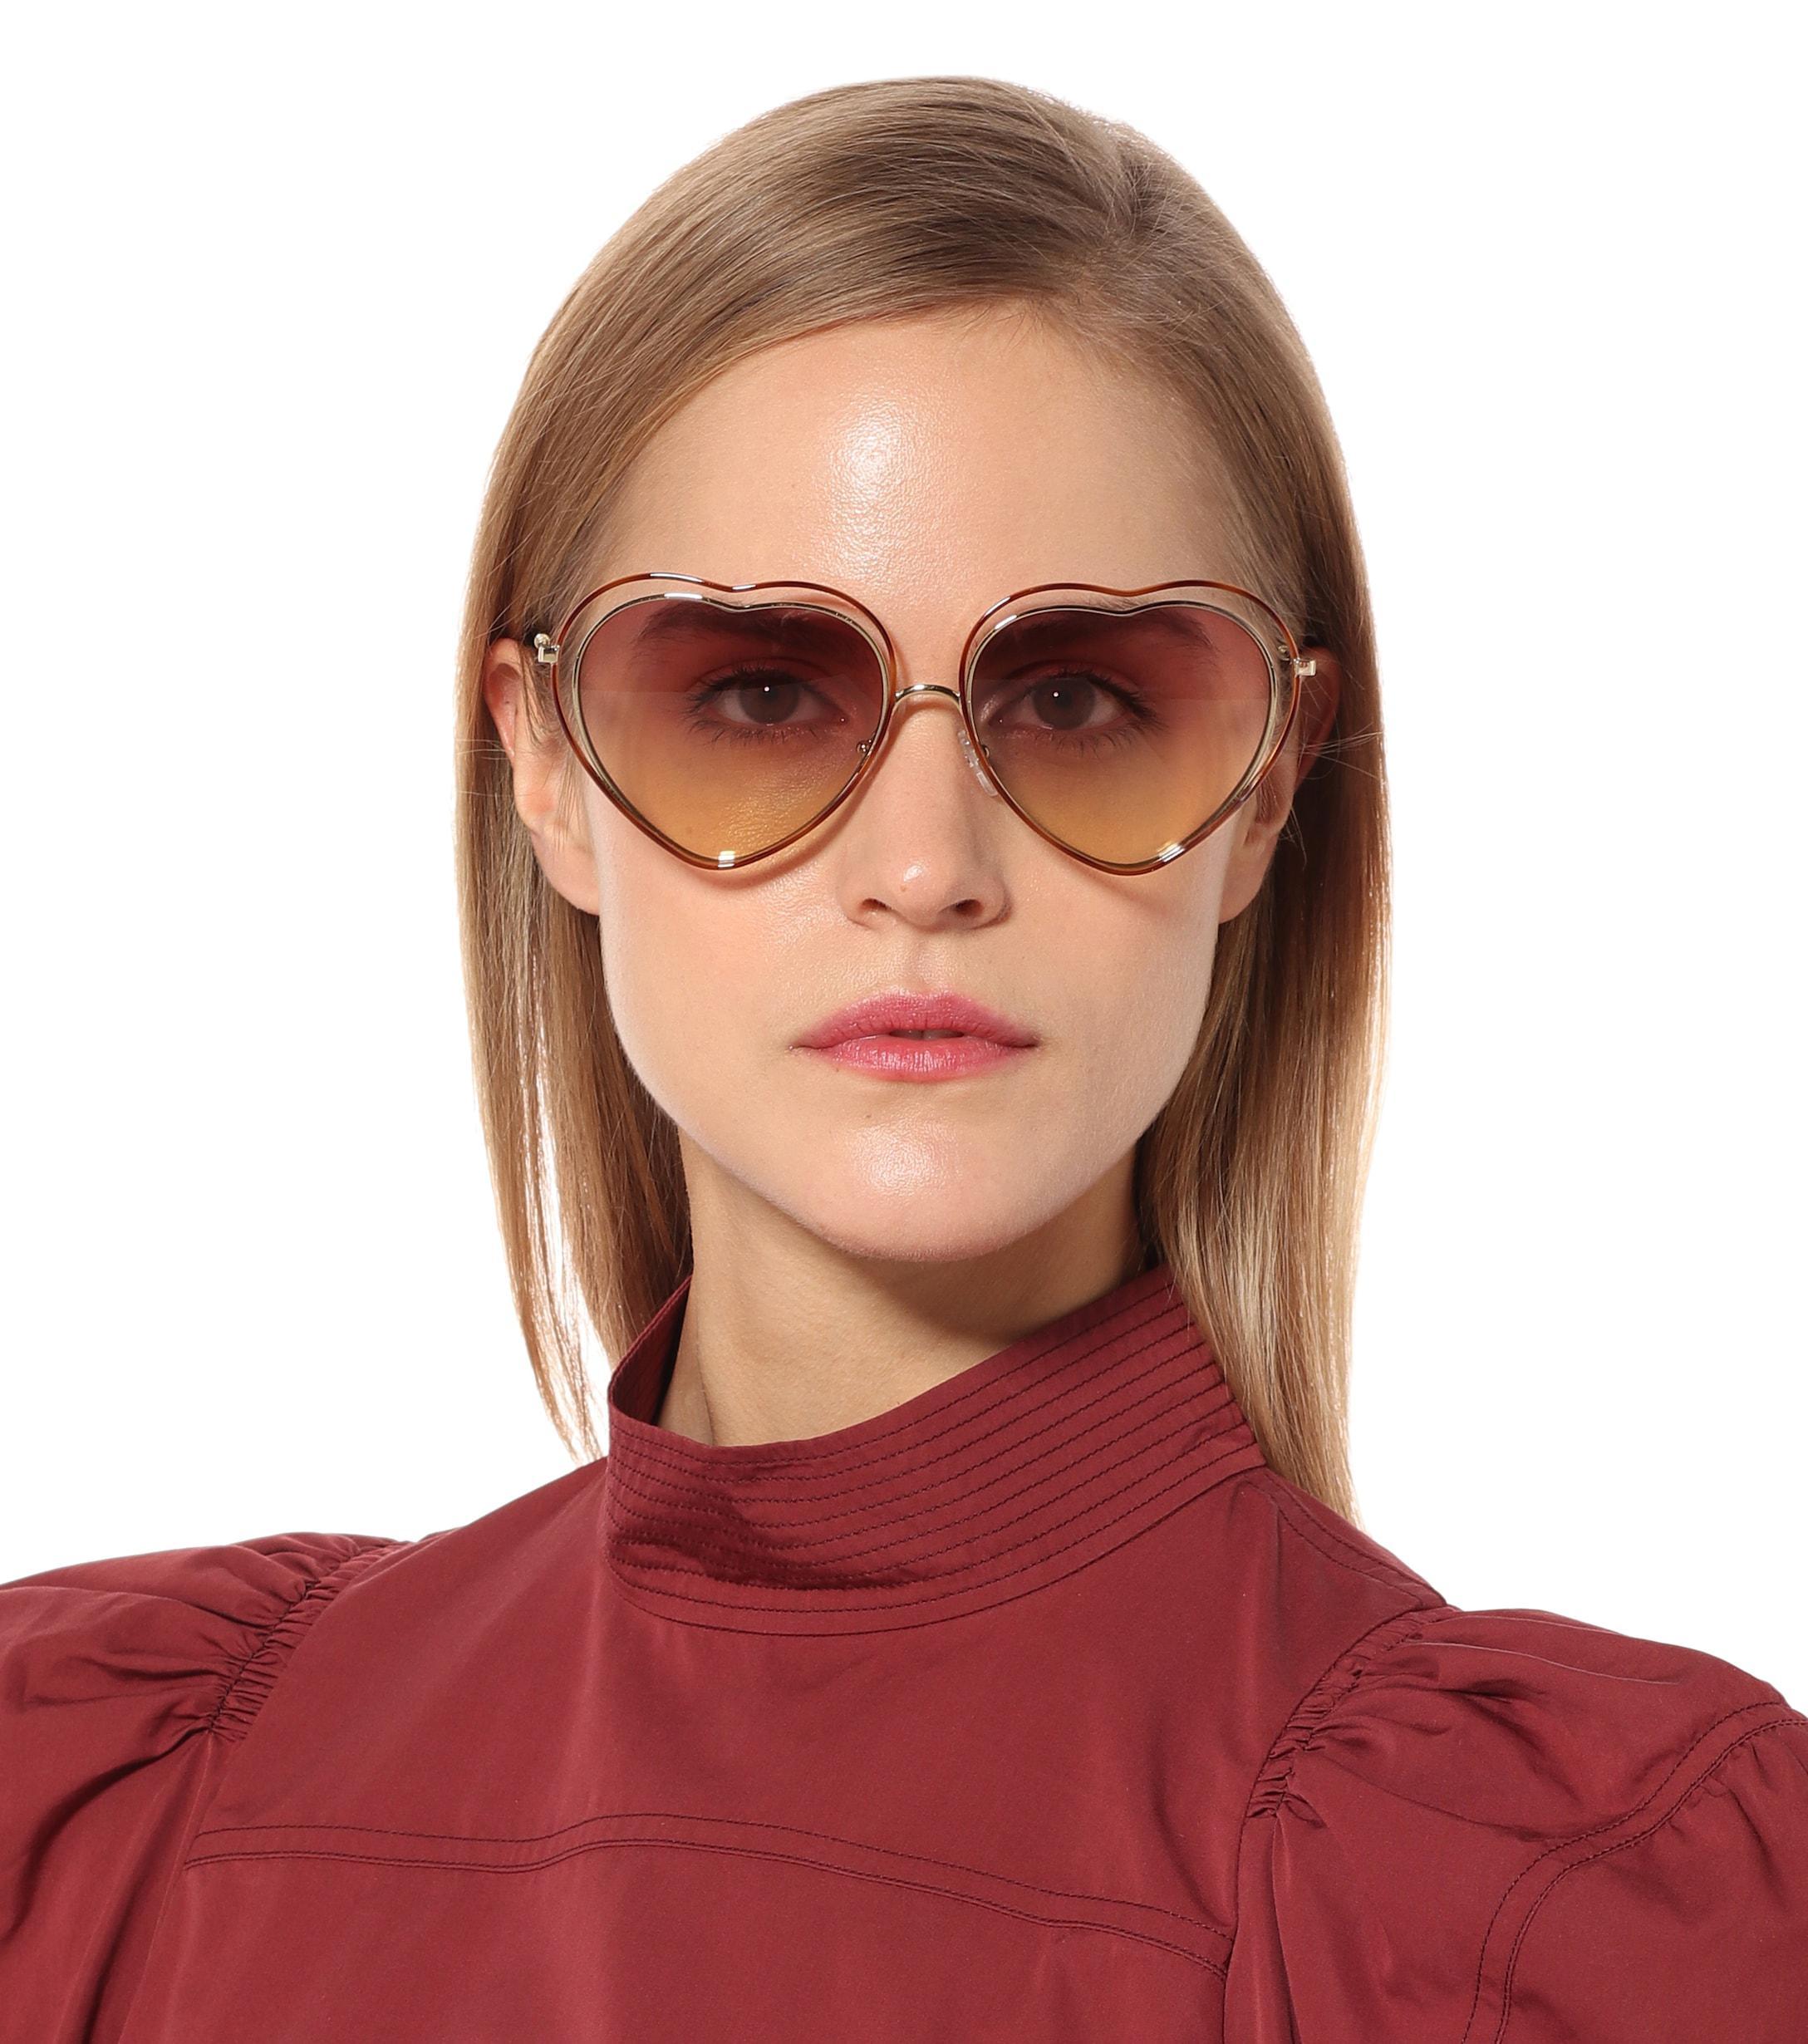 92e220ec04 ... Poppy Heart-shaped Sunglasses - Lyst. View fullscreen